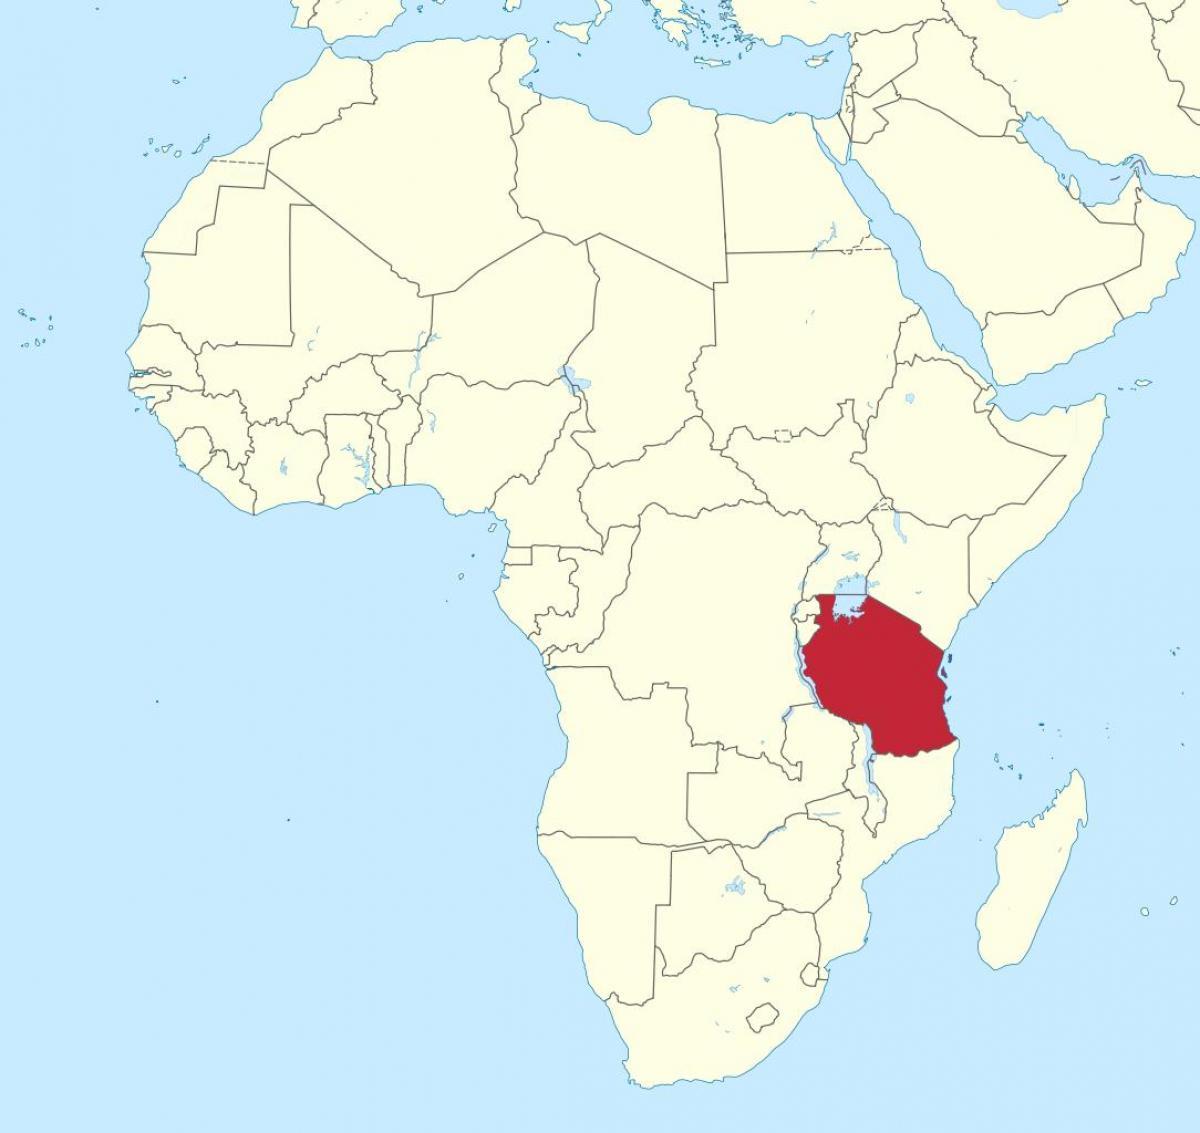 Map Of Africa Tanzania.Tanzania On A Map Of Africa Tanzania On The Map Of Africa Eastern